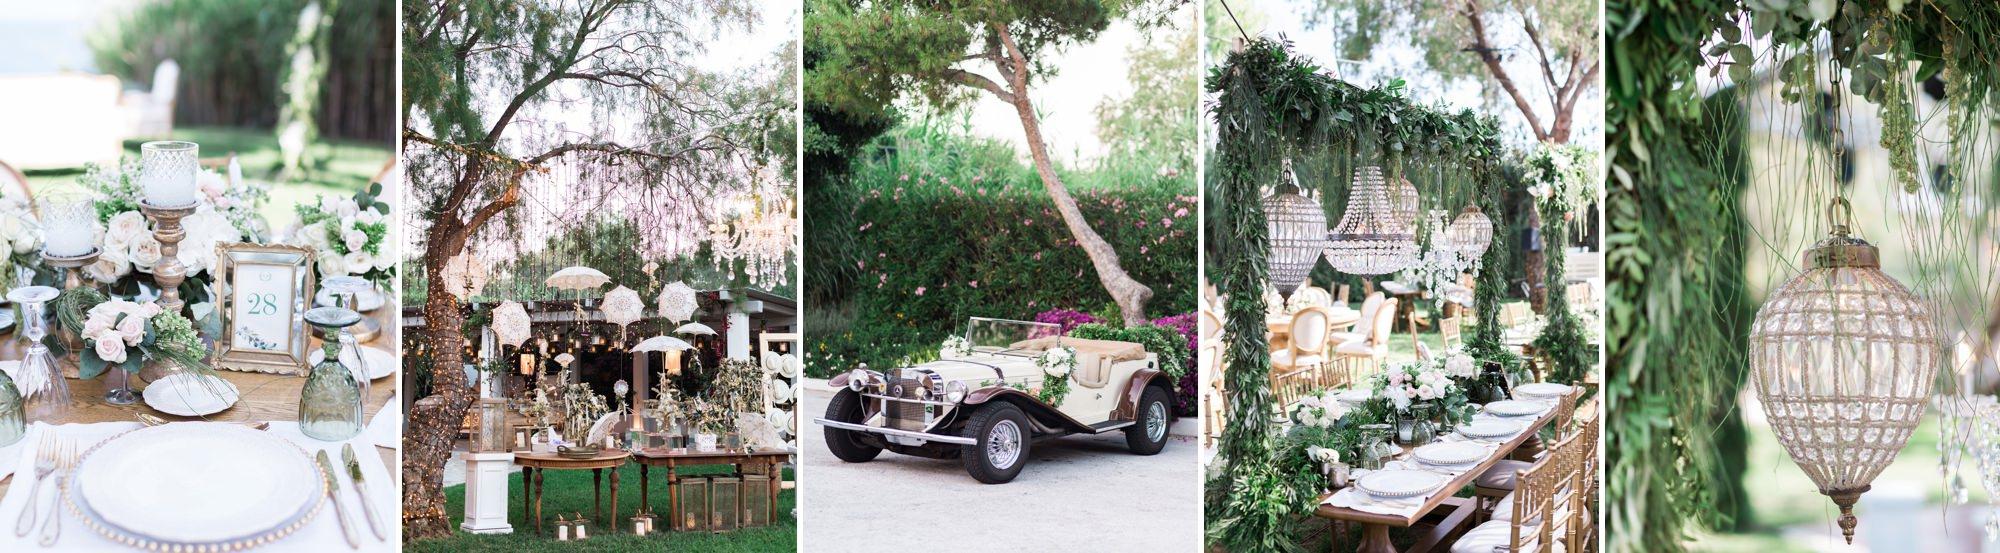 best wedding photoshoots ideas